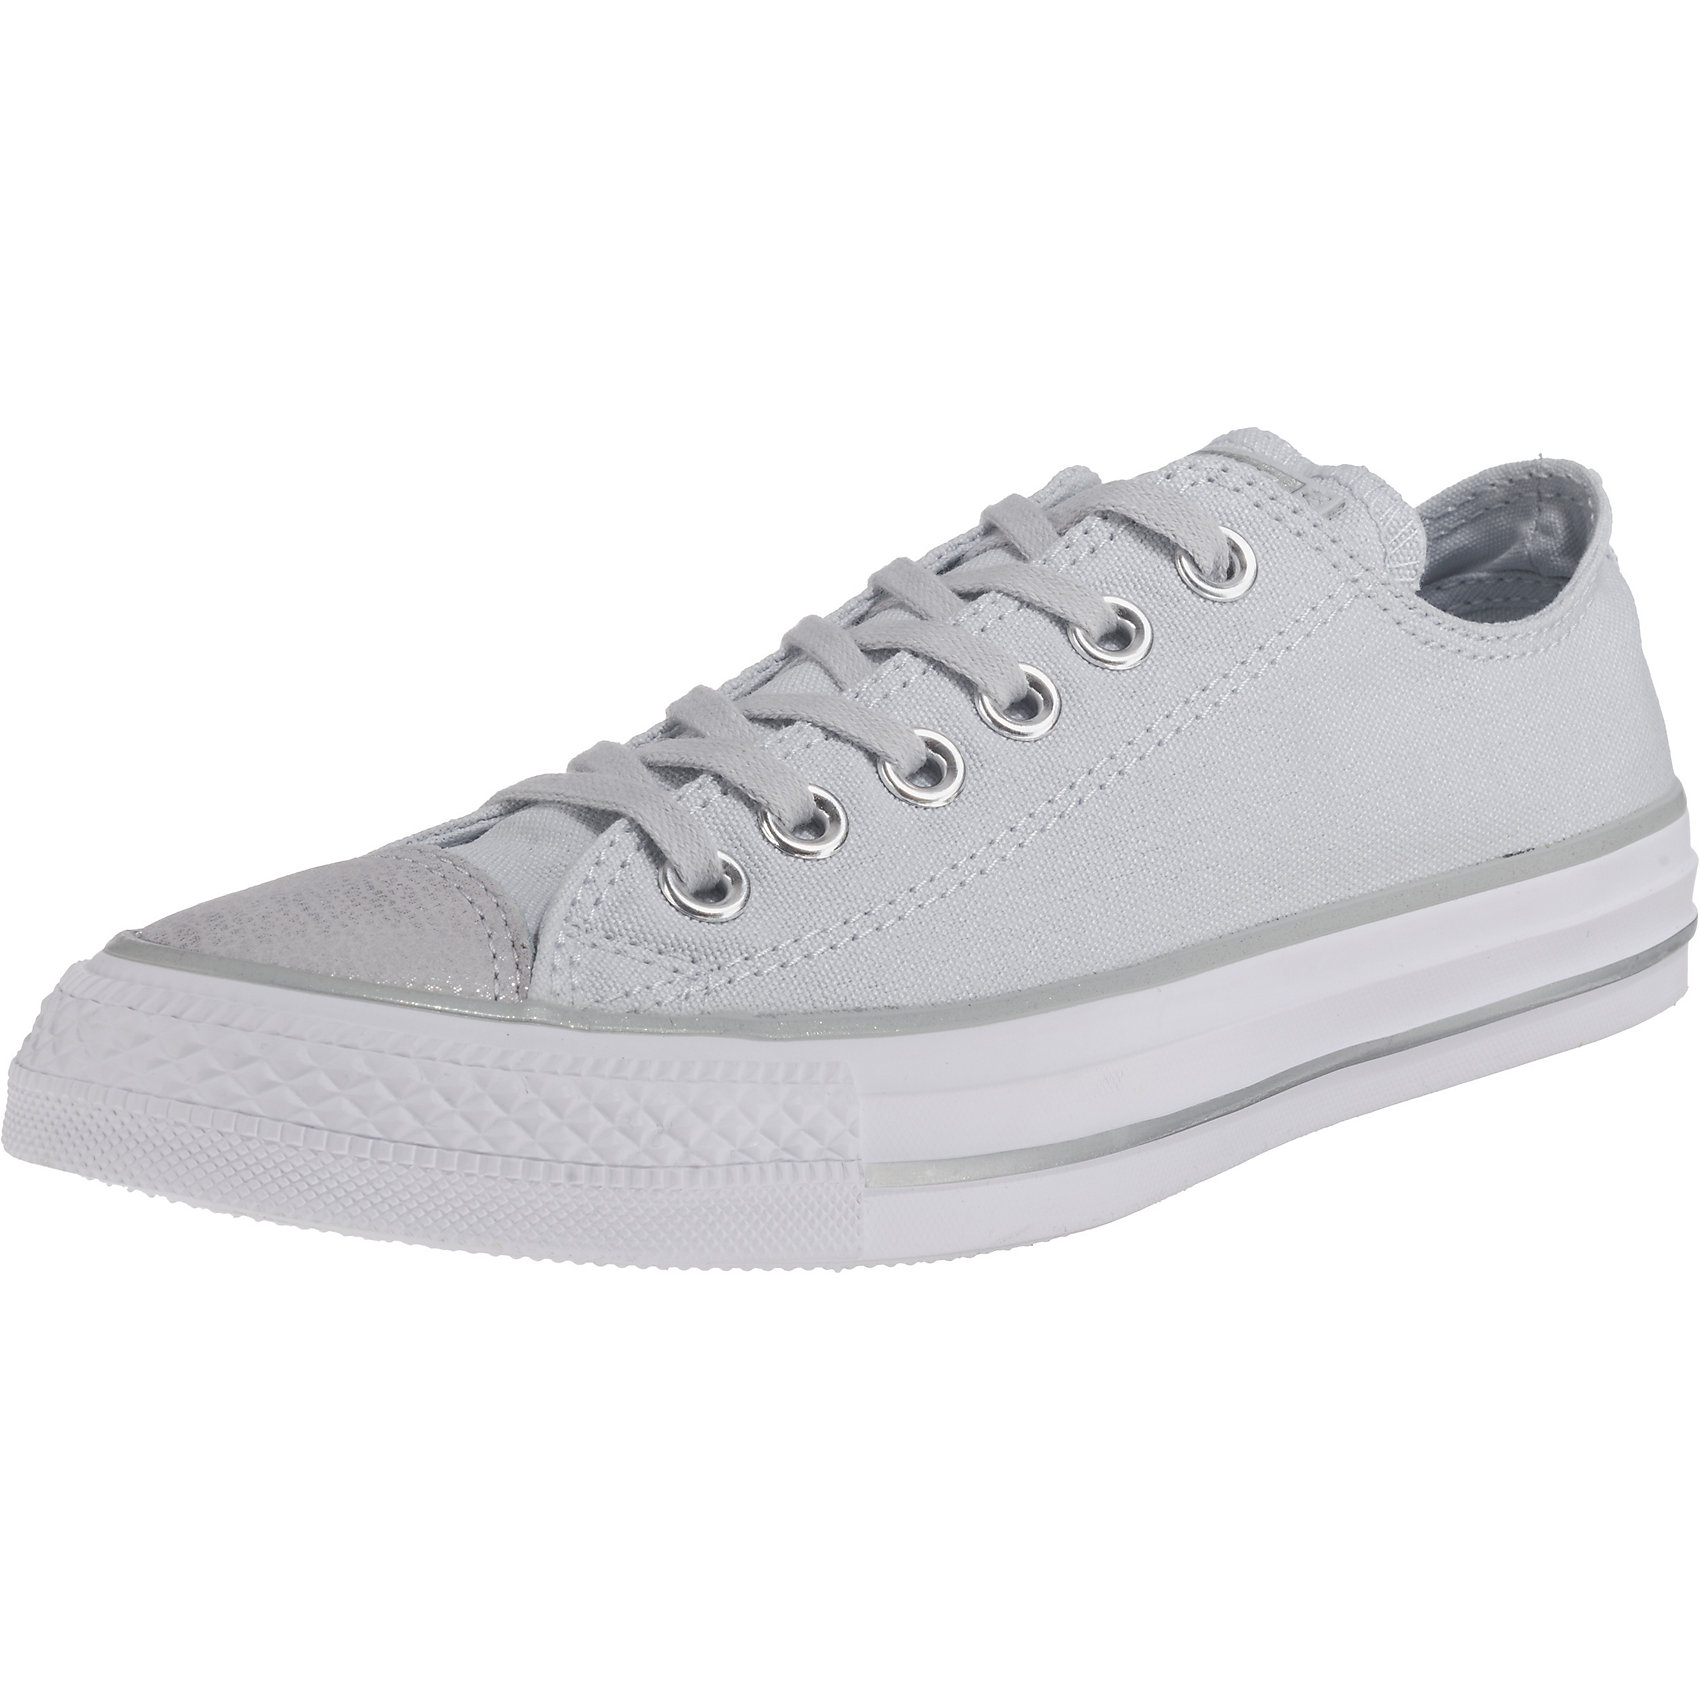 Converse Damen Chck Taylor All Star OX Sneaker